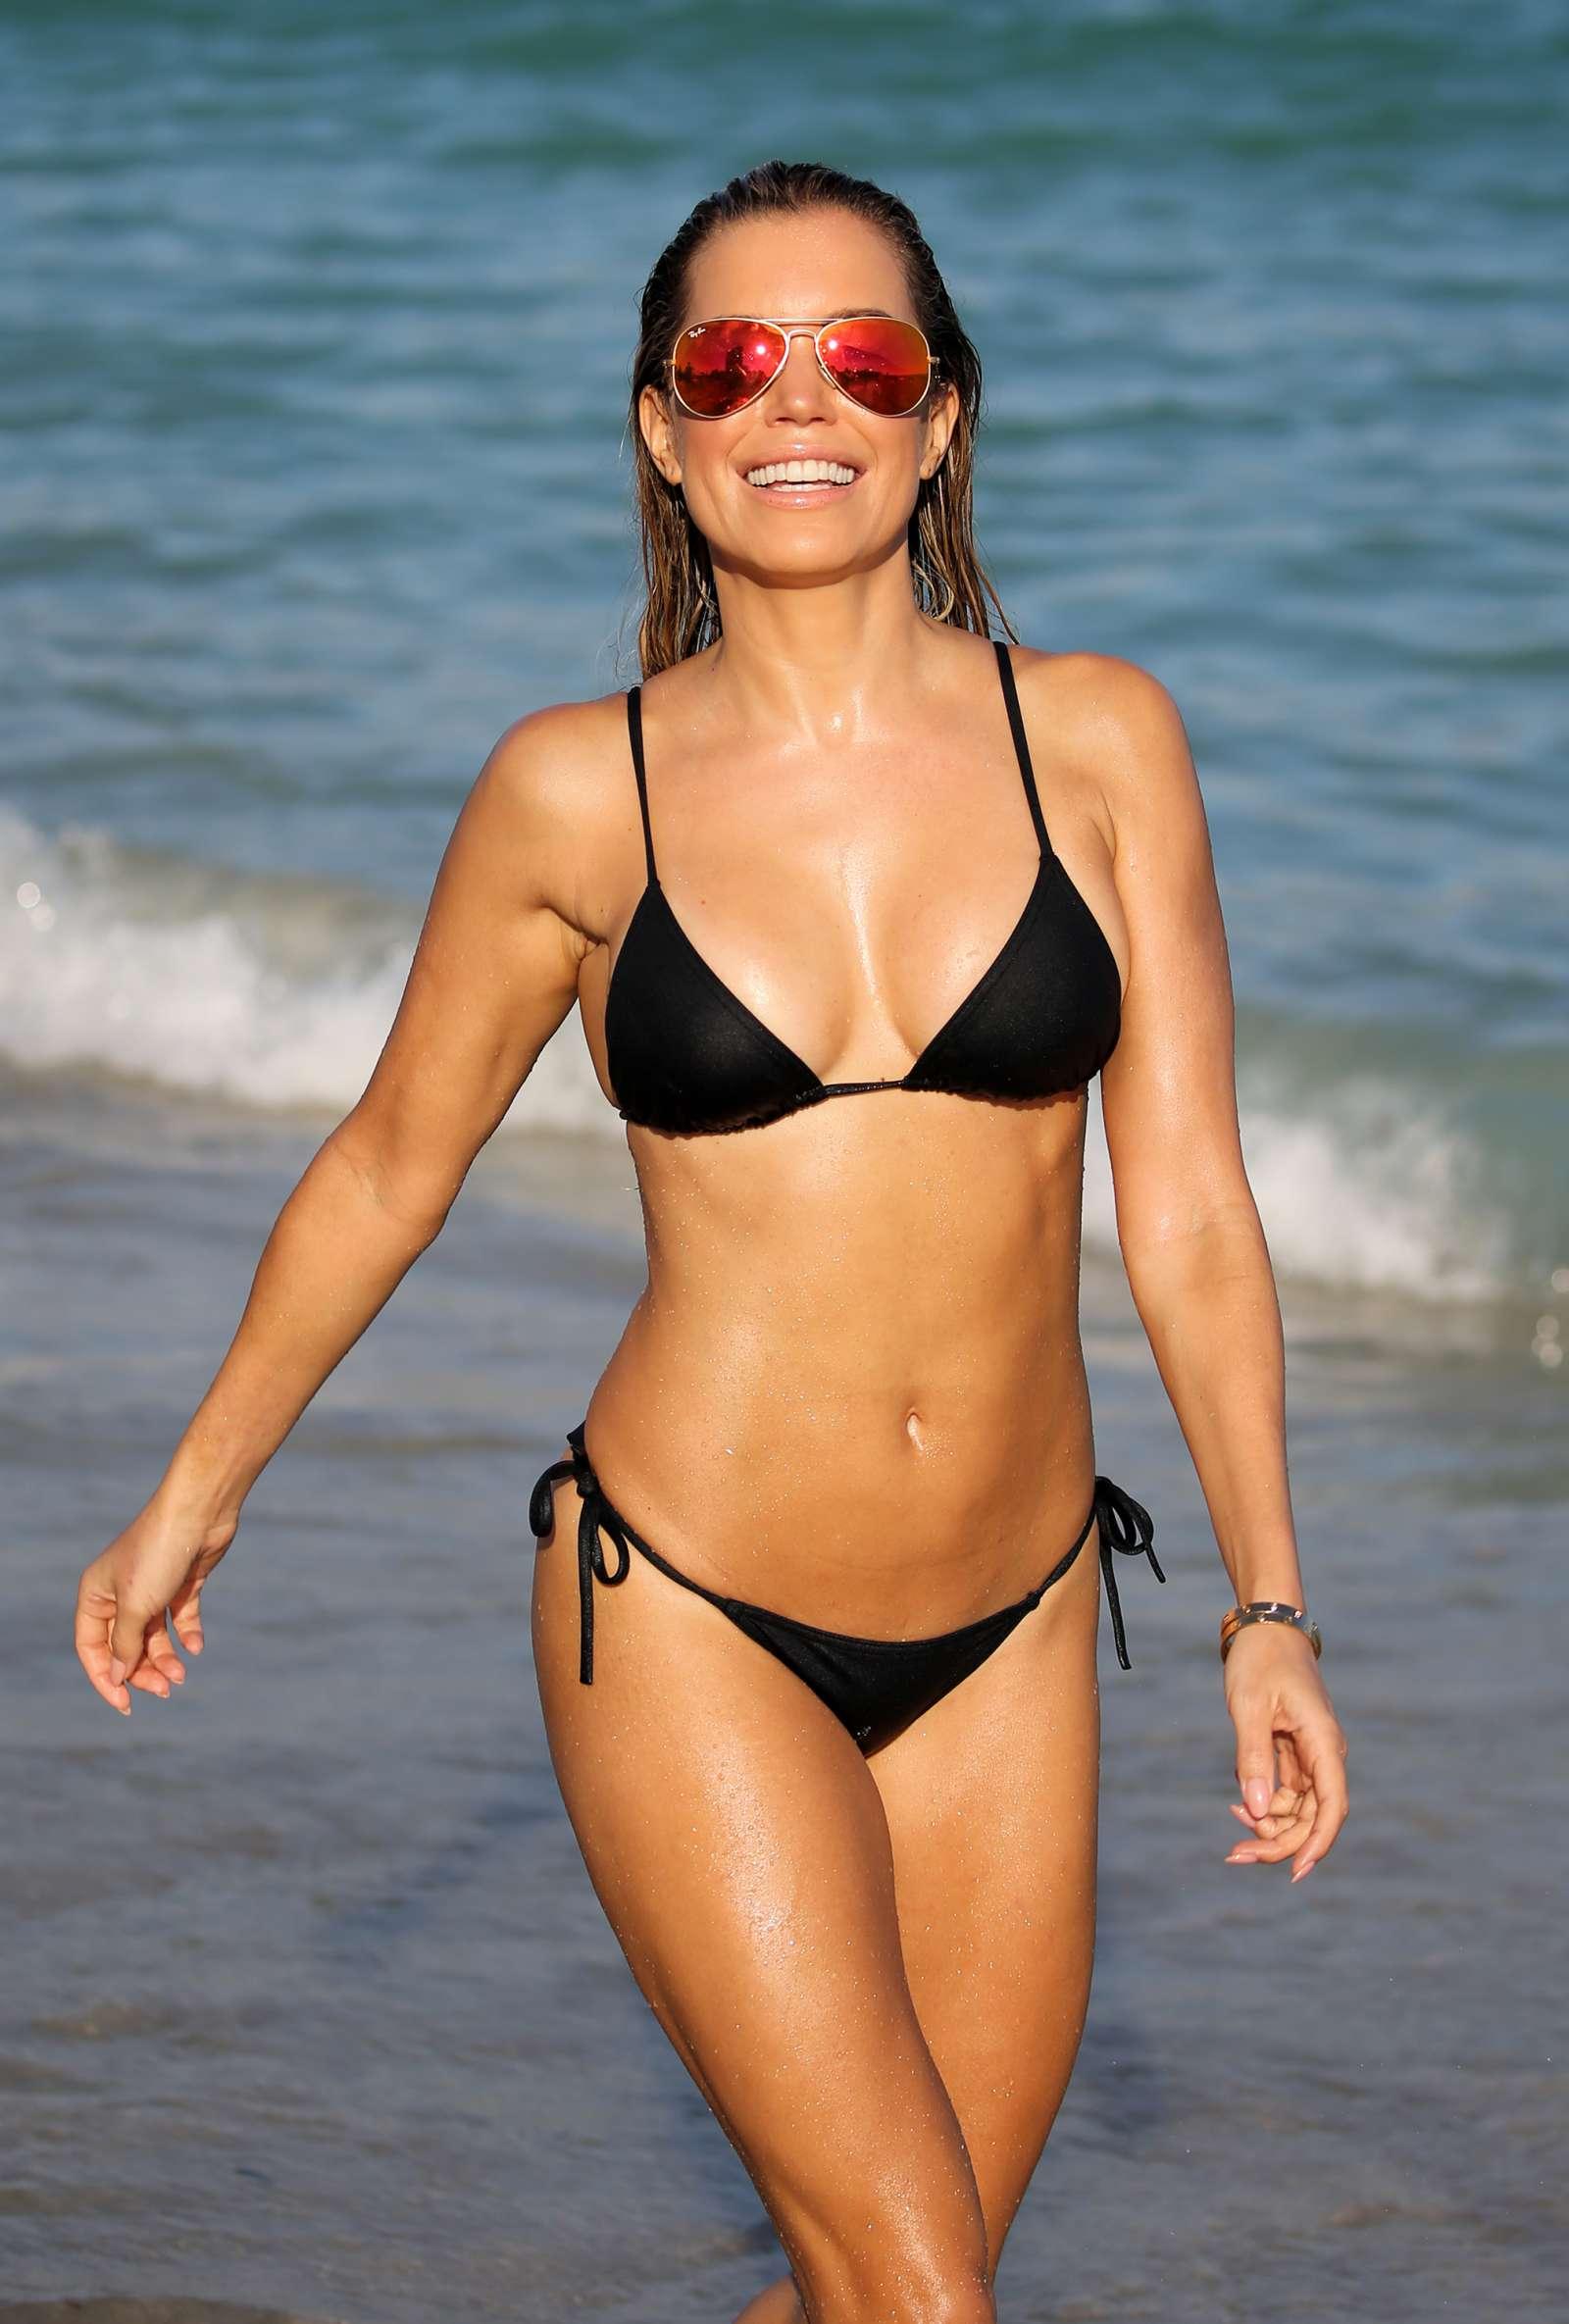 Sylvie Meis 2017 : Sylvie Meis in Black Bikini 2017 -25